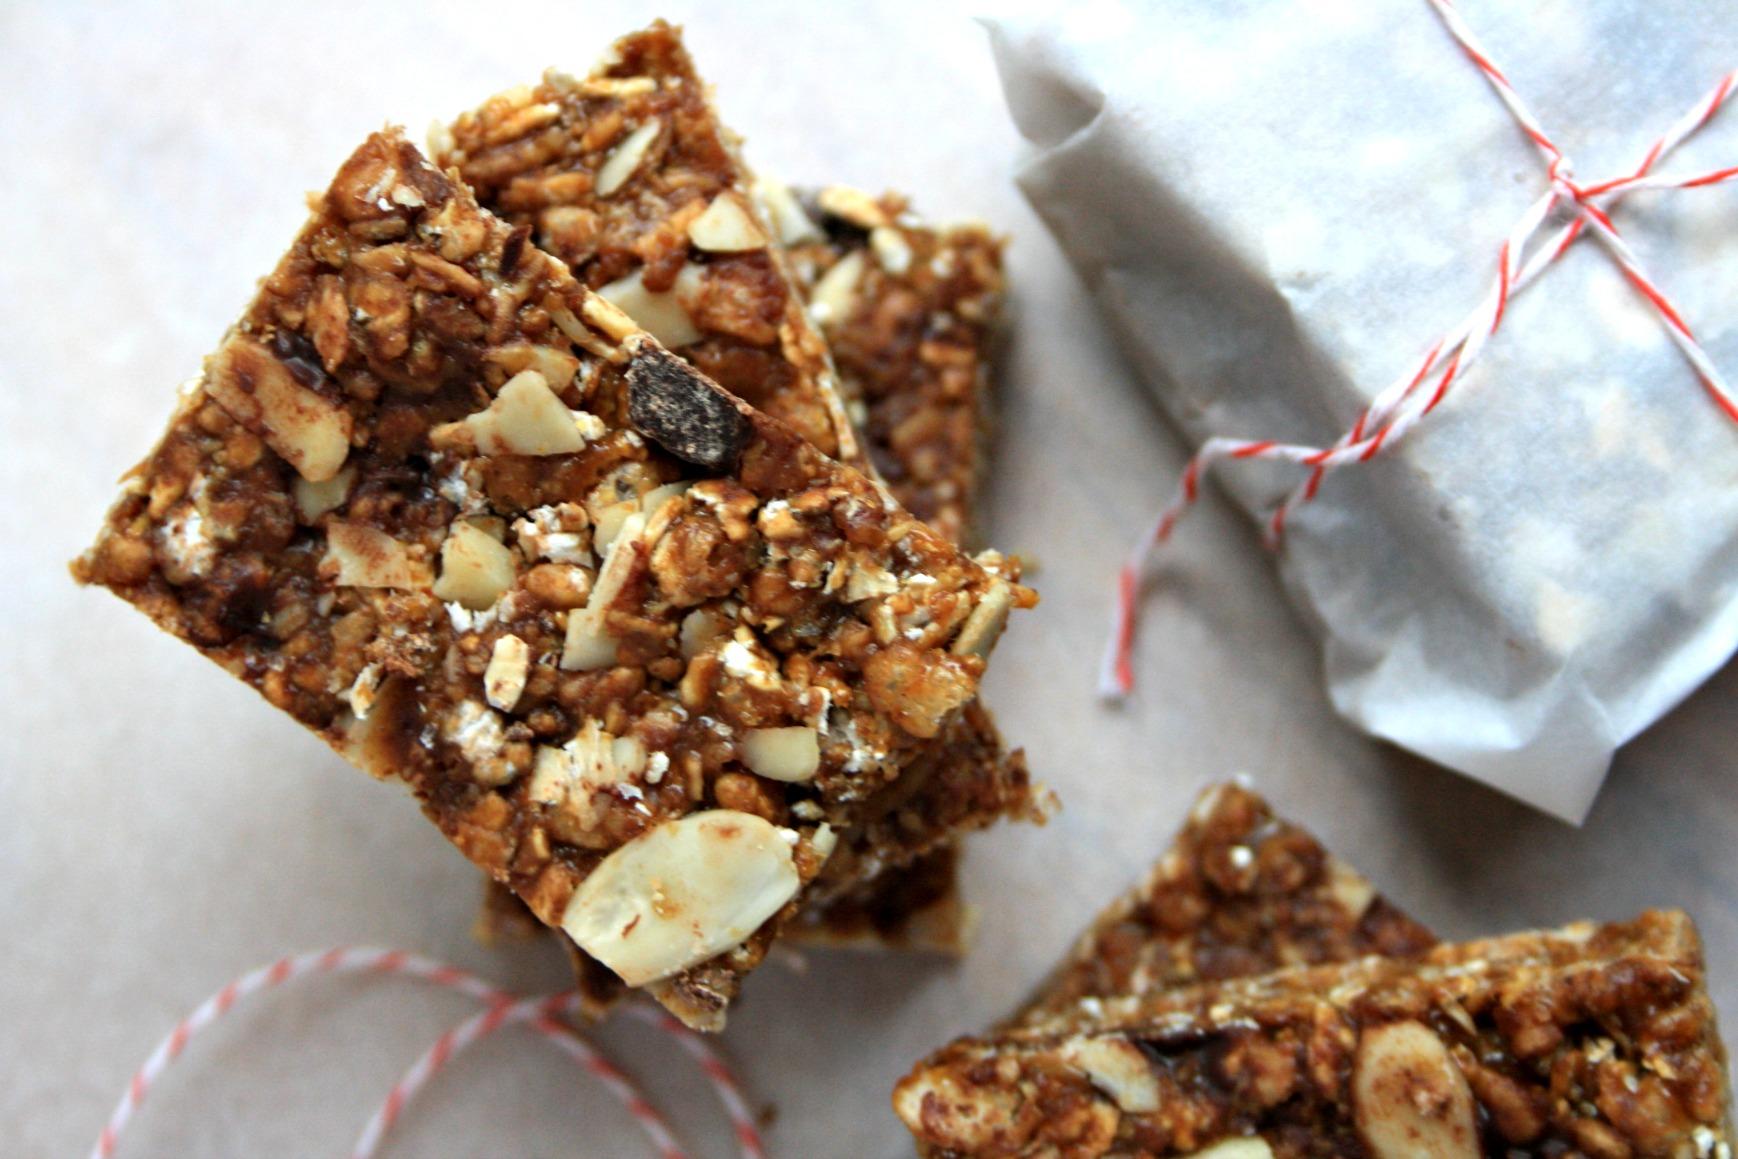 Gluten free crispy almond butter granola bars